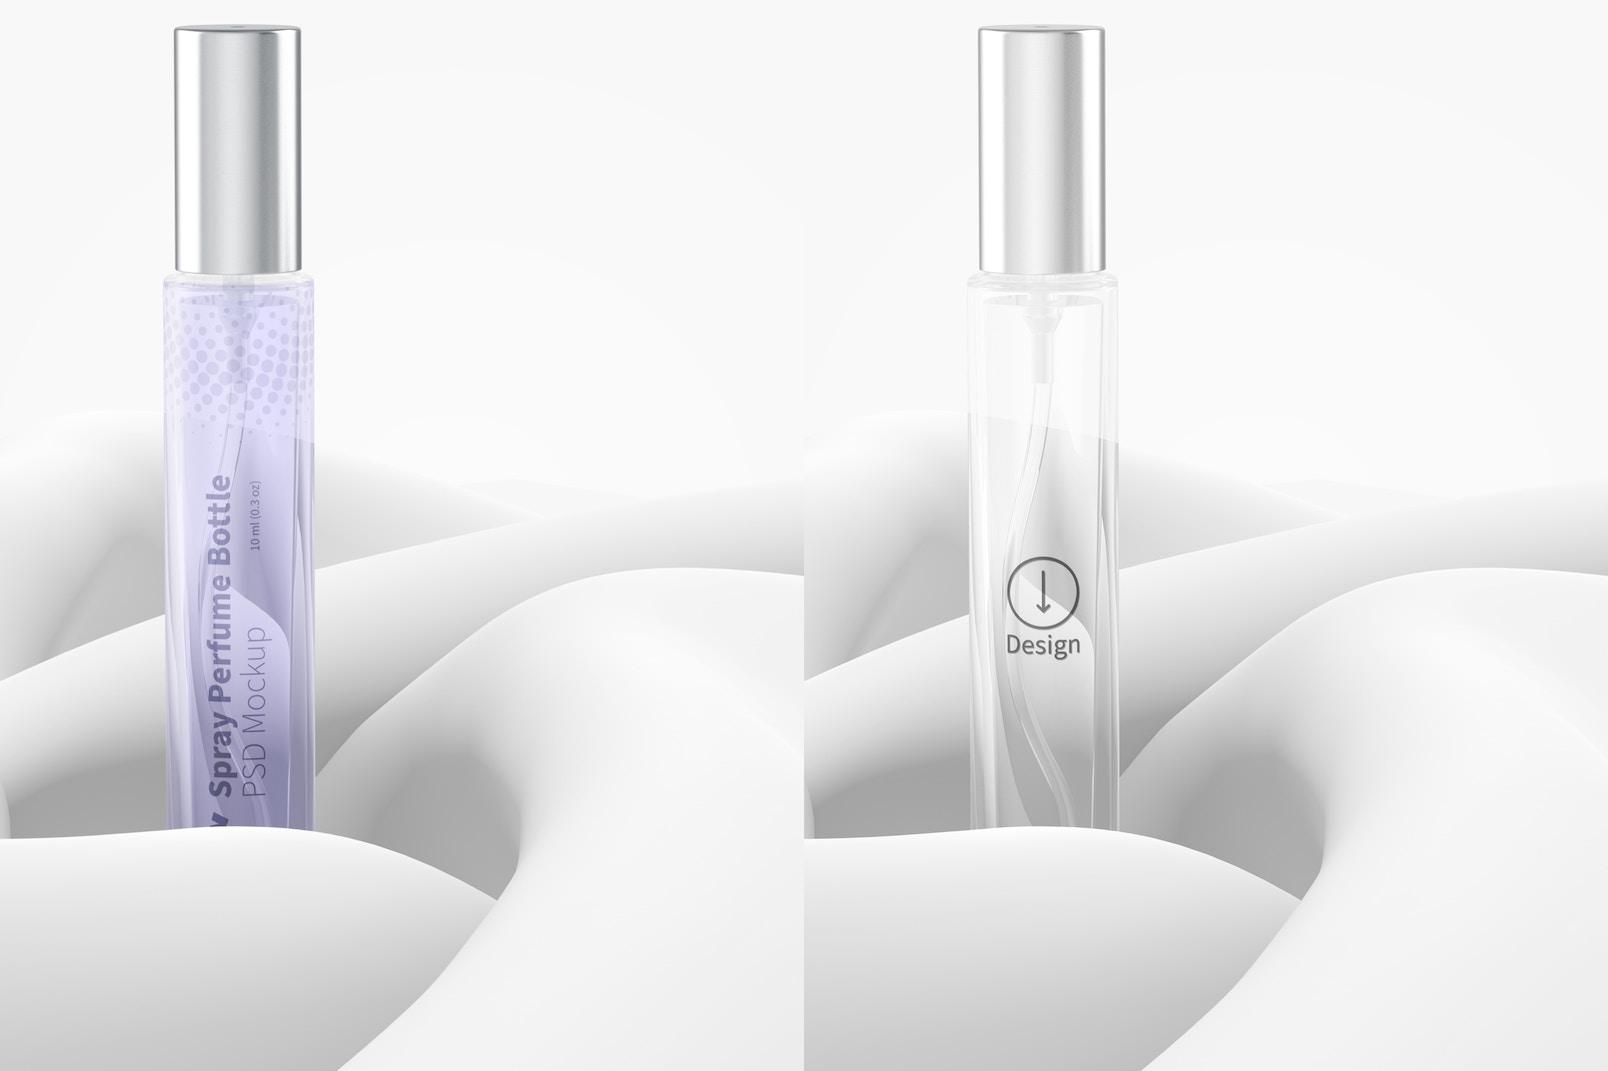 10 ml Spray Perfume Bottle Mockup